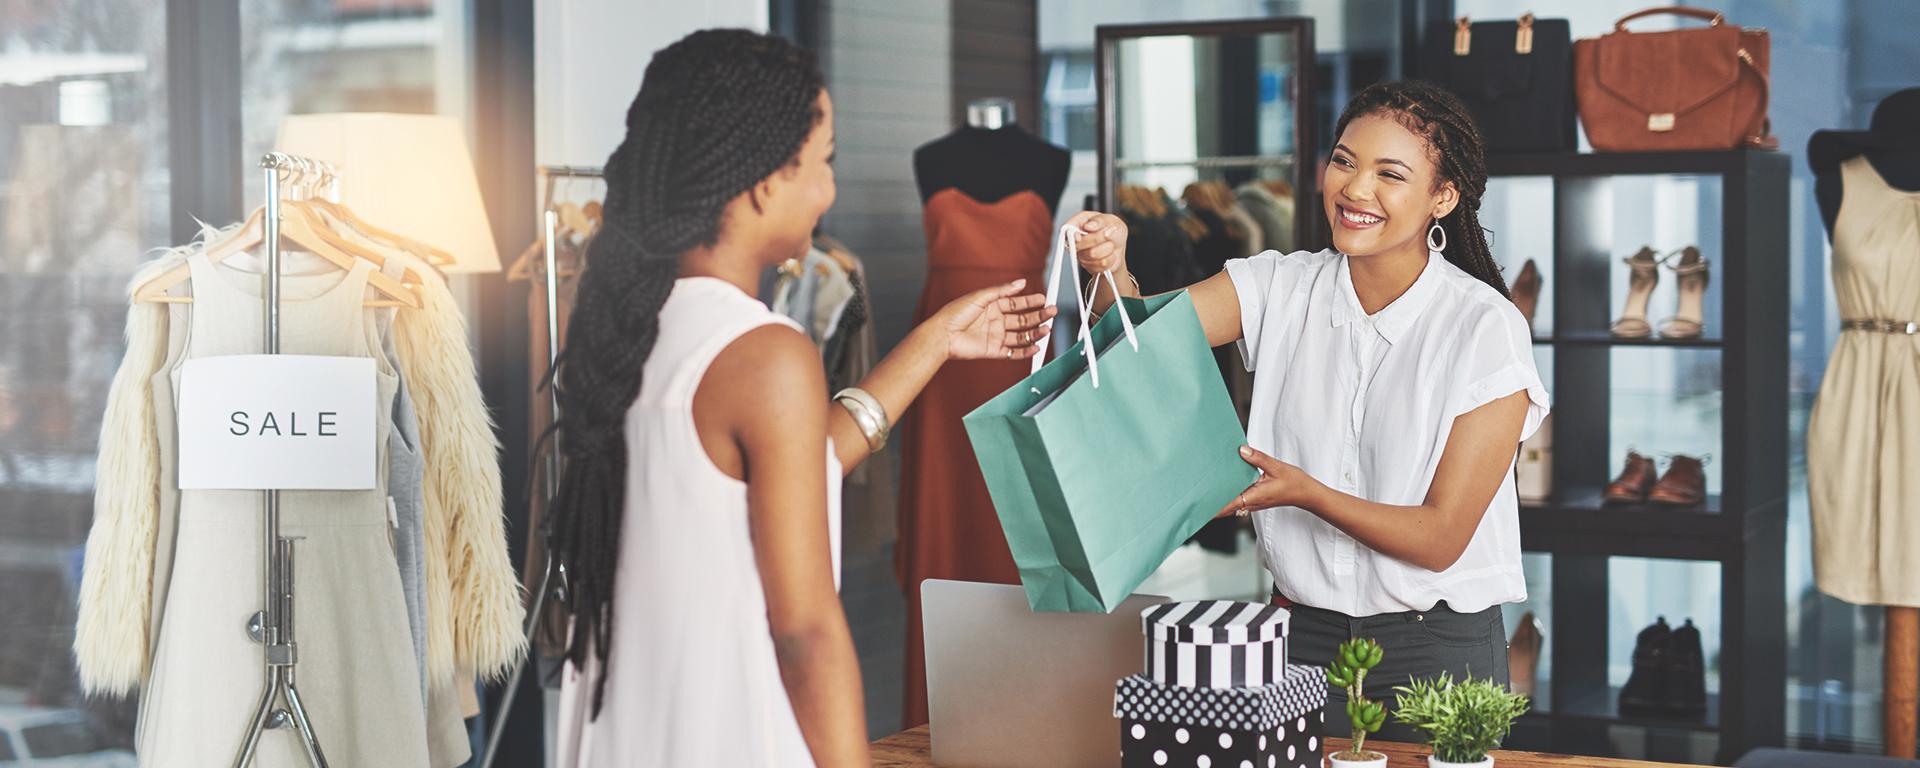 Shops & Office Insurance